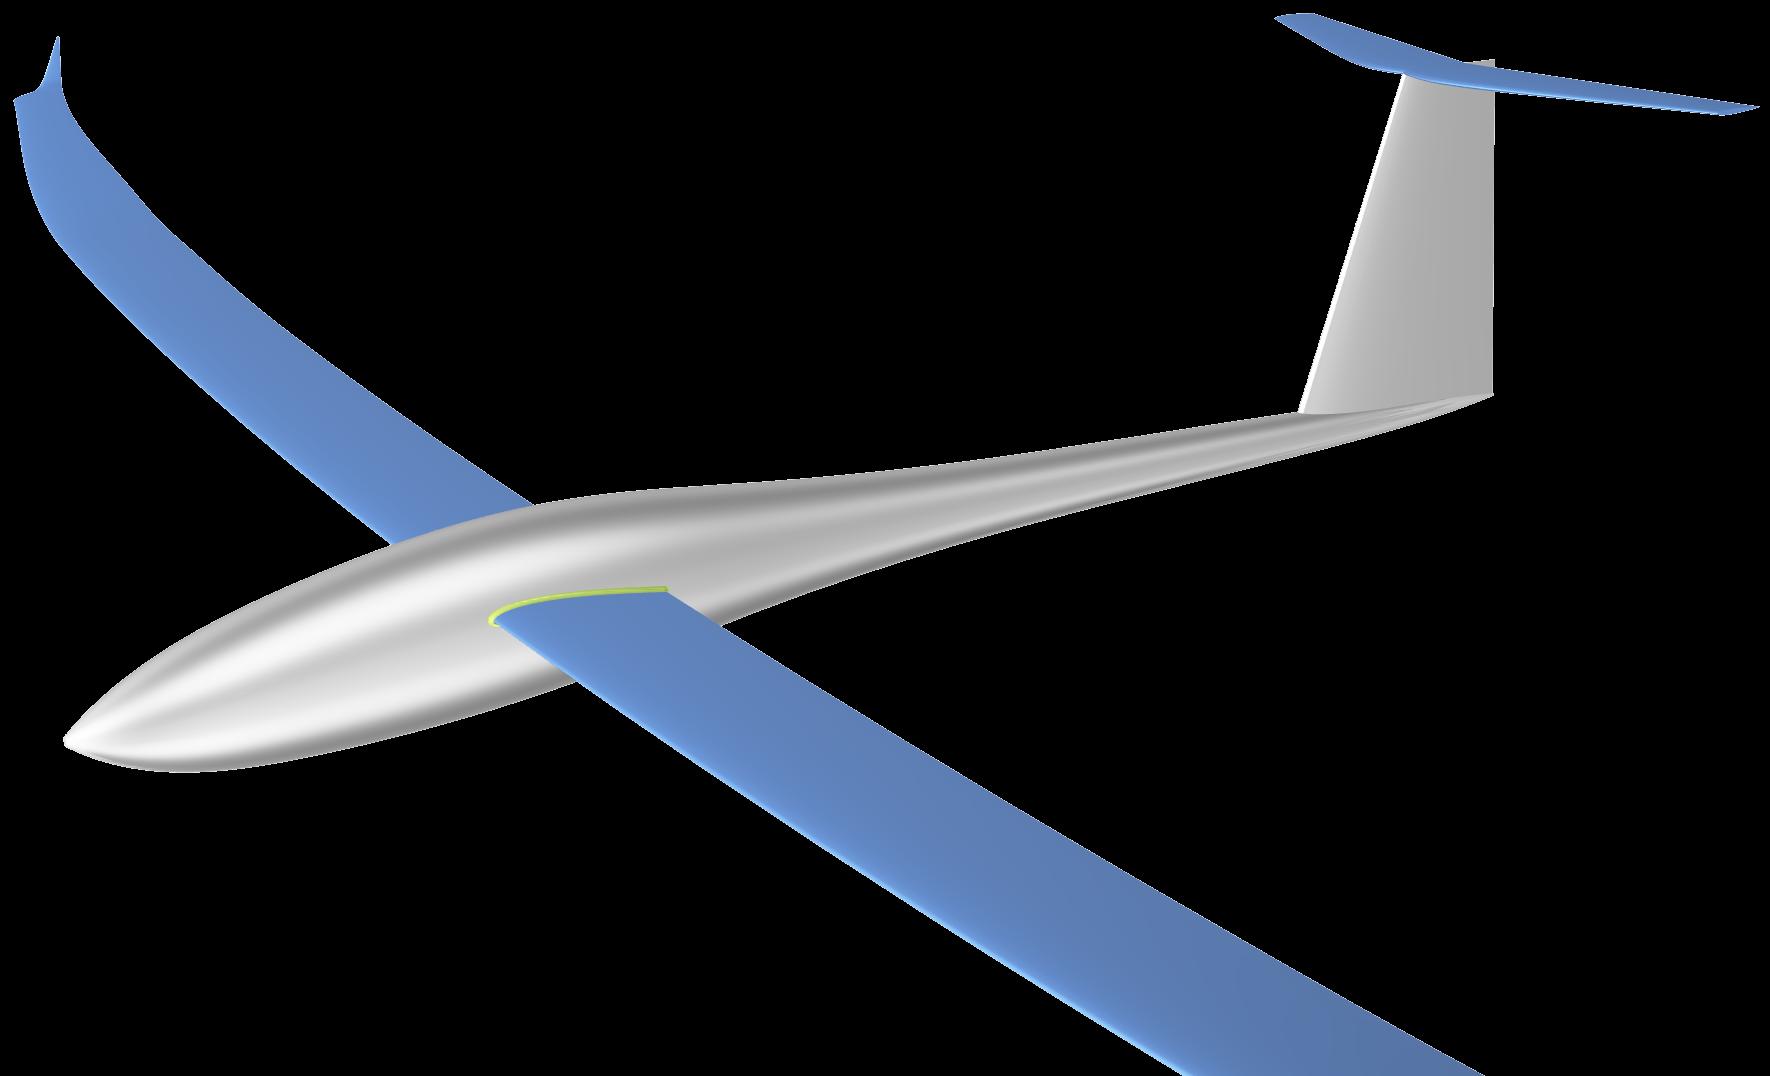 glider plane design with CAESES